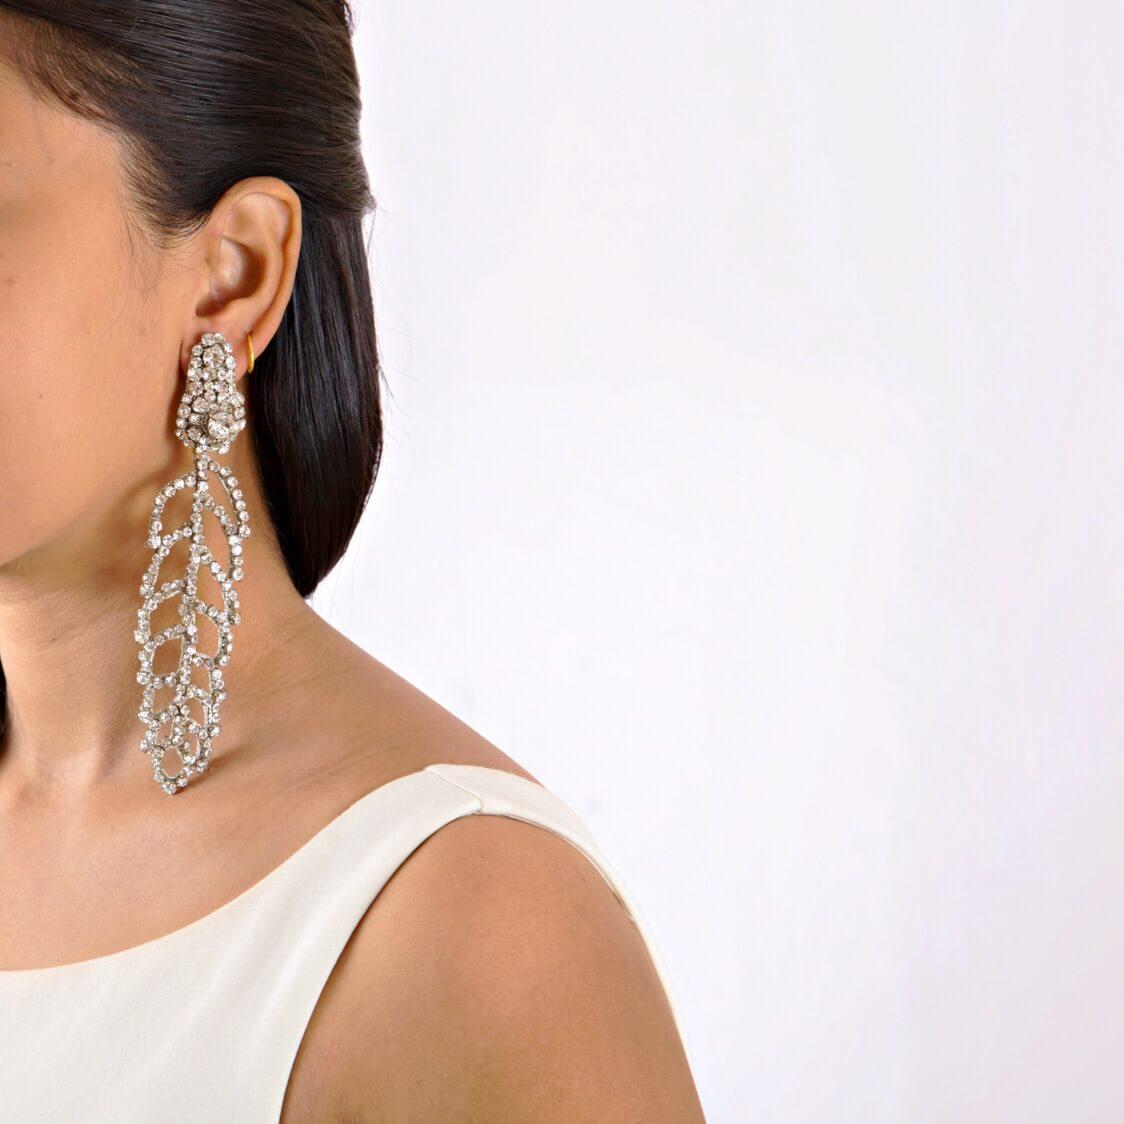 Electa Clear Earring